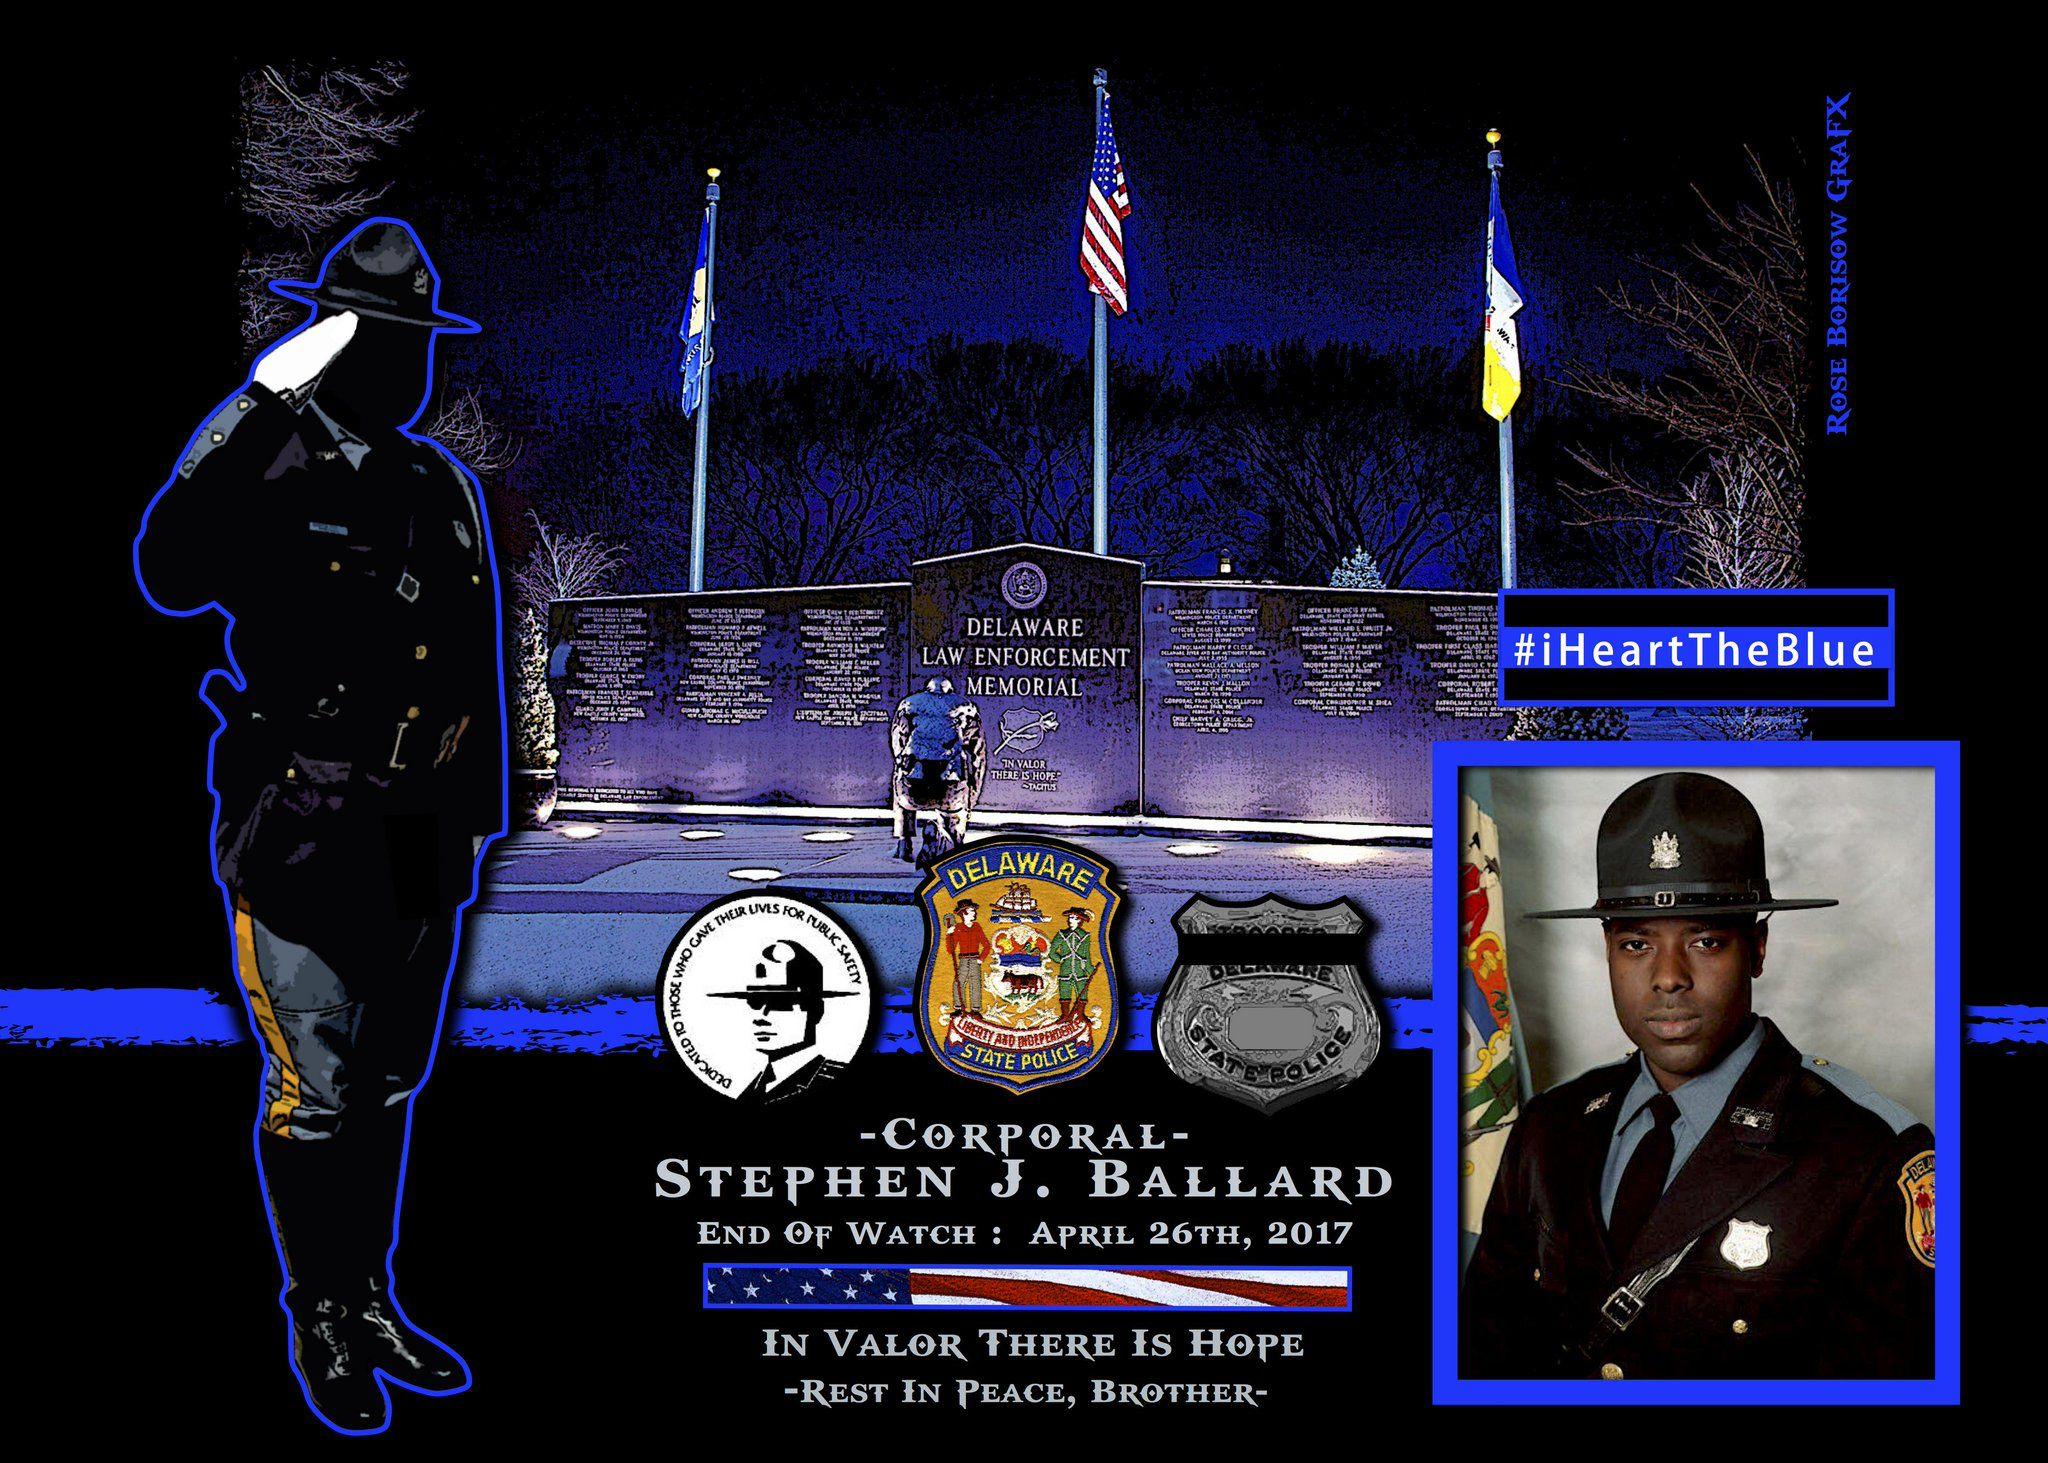 Stephen Ballard Memoriam, Police, State police